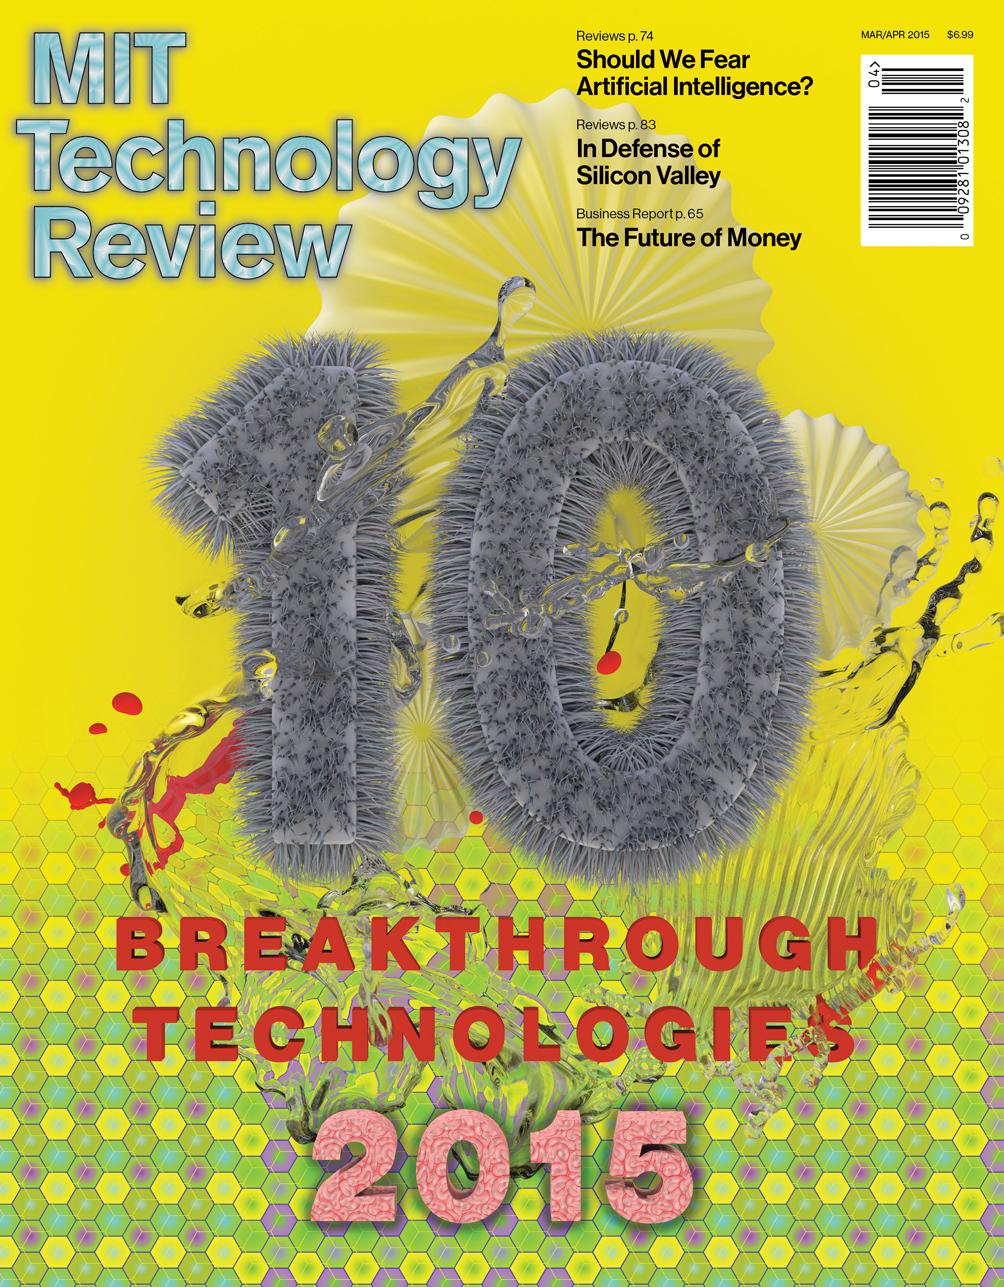 10 Breakthrough Technologies 2015